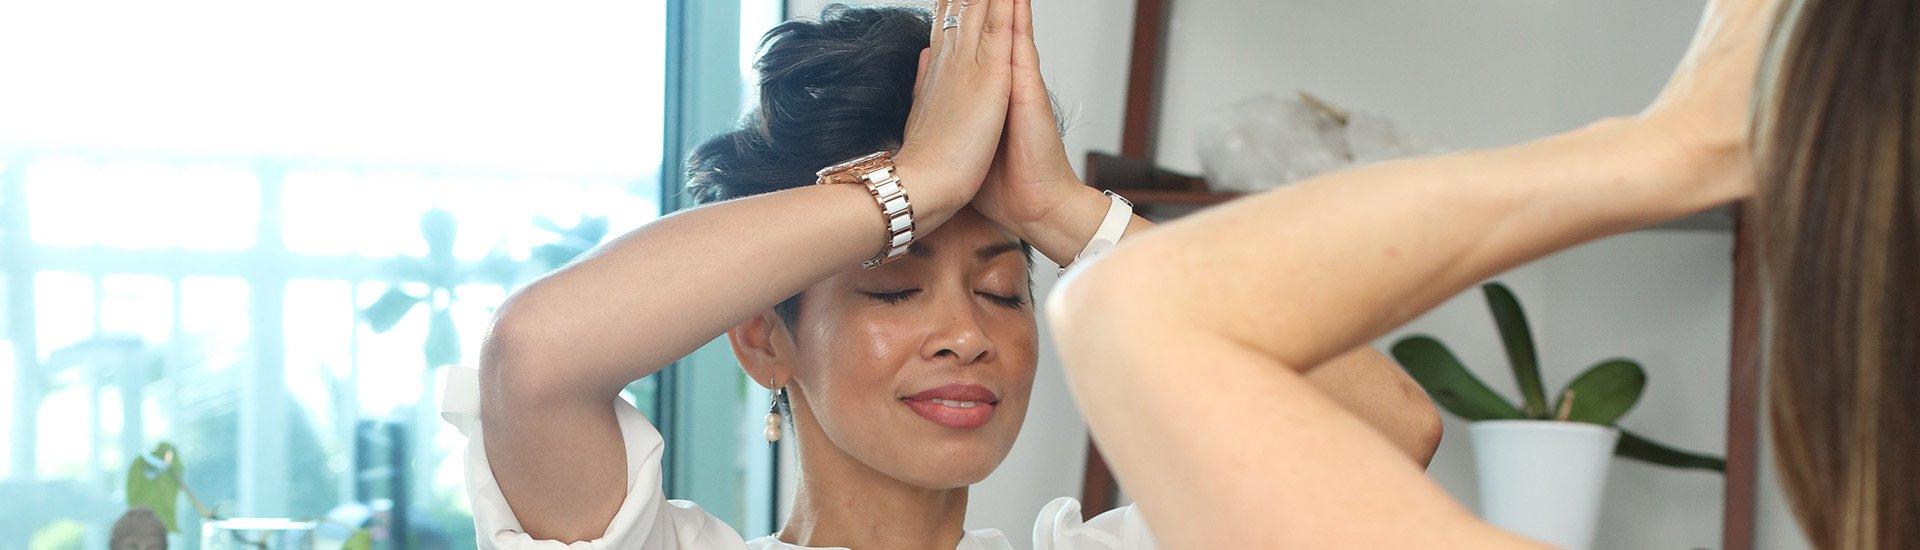 woman-meditating-1